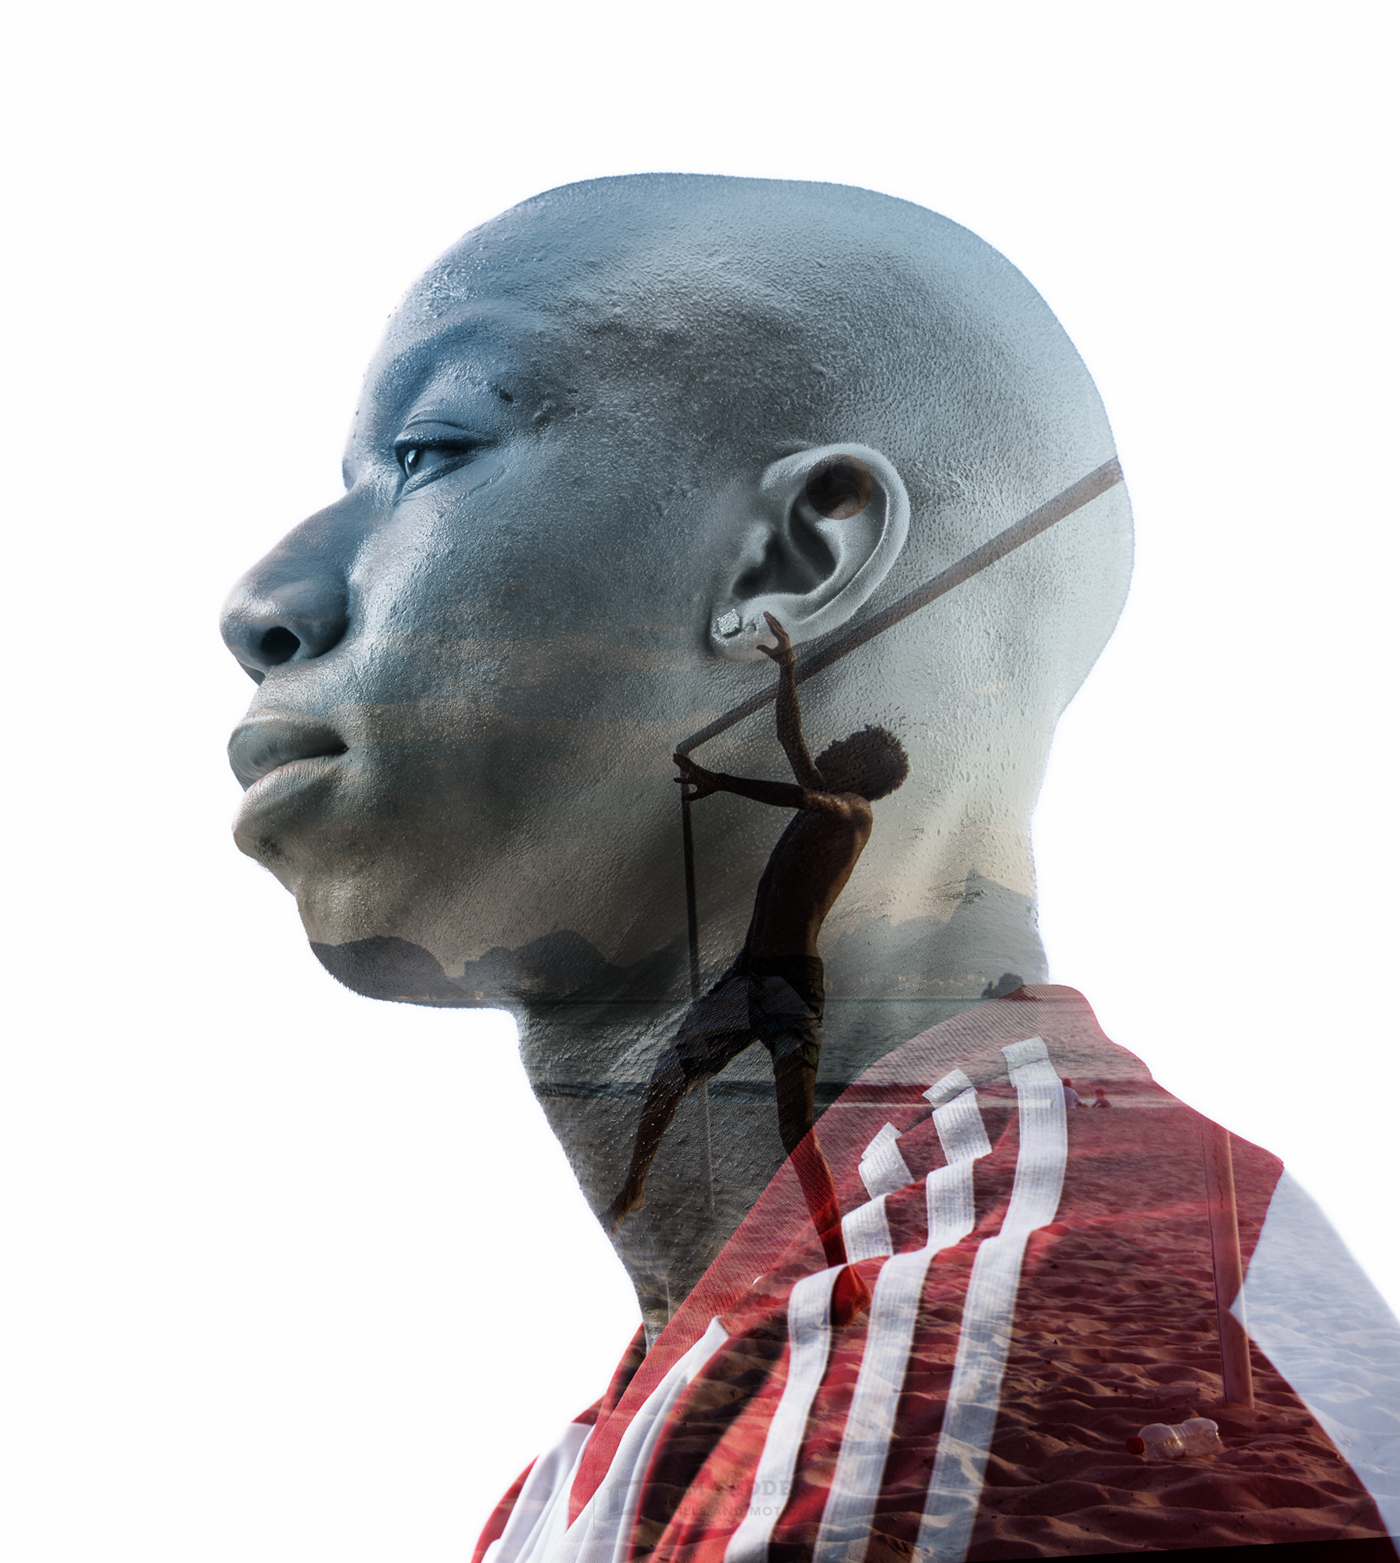 soccer portrait double Exposure athletes mls Brazil world cup portraits sport sports